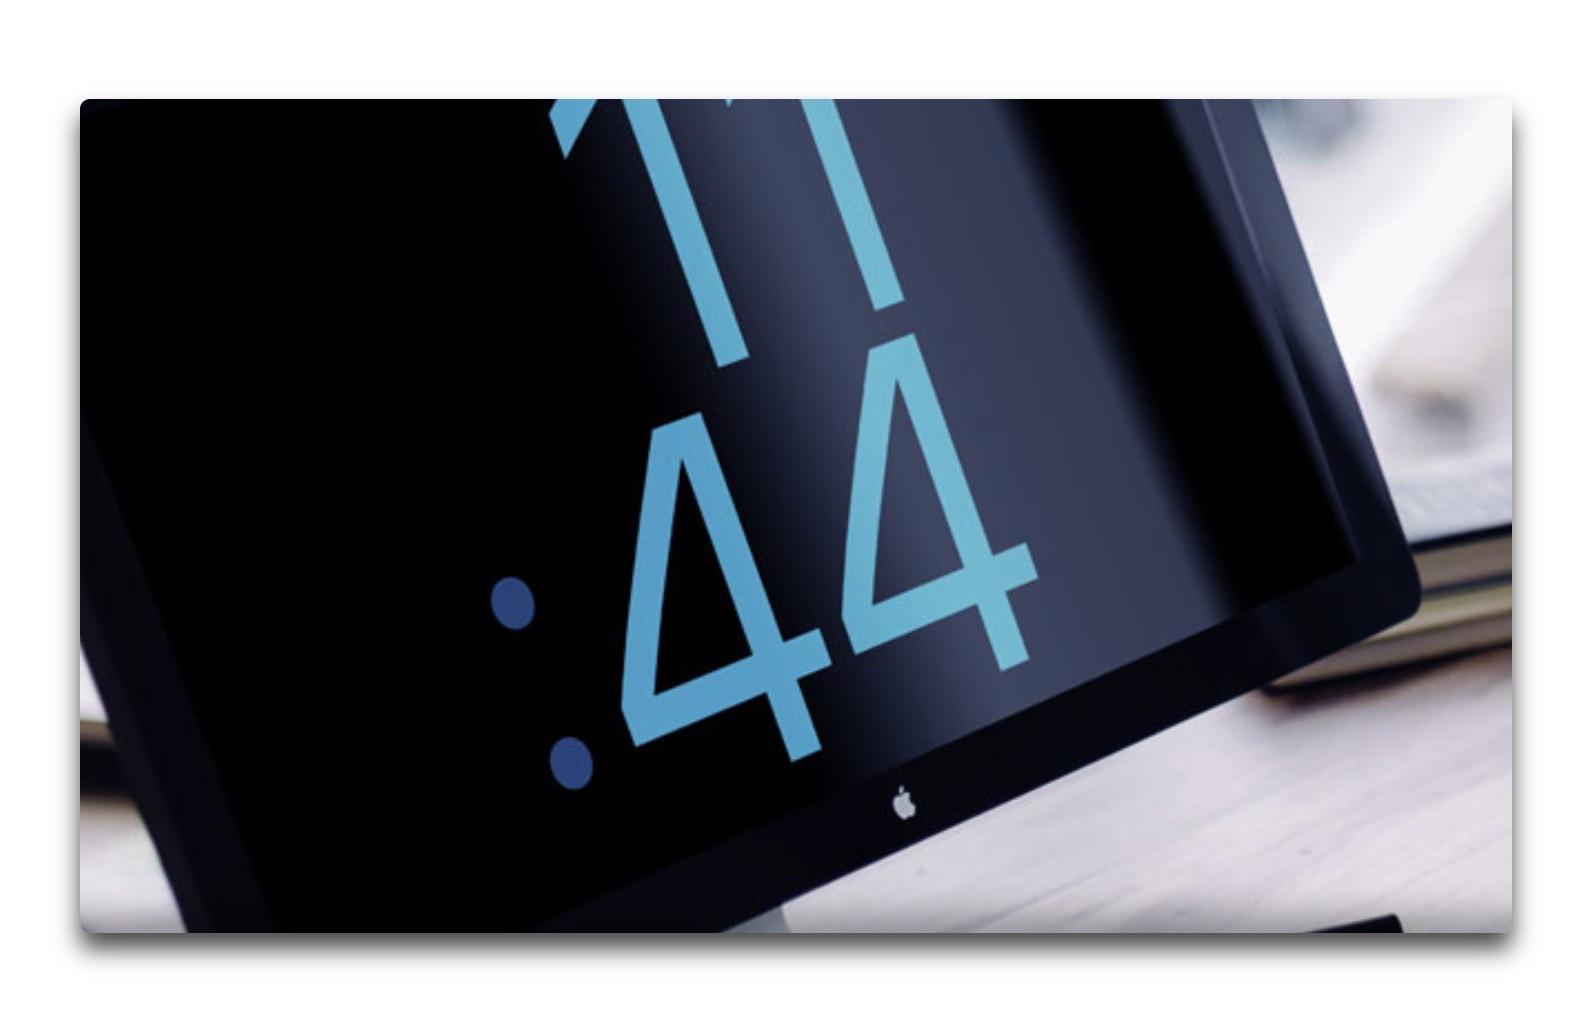 Apple Watchの文字版を表示するMacのスクリーンセーバ「Watch OS X」